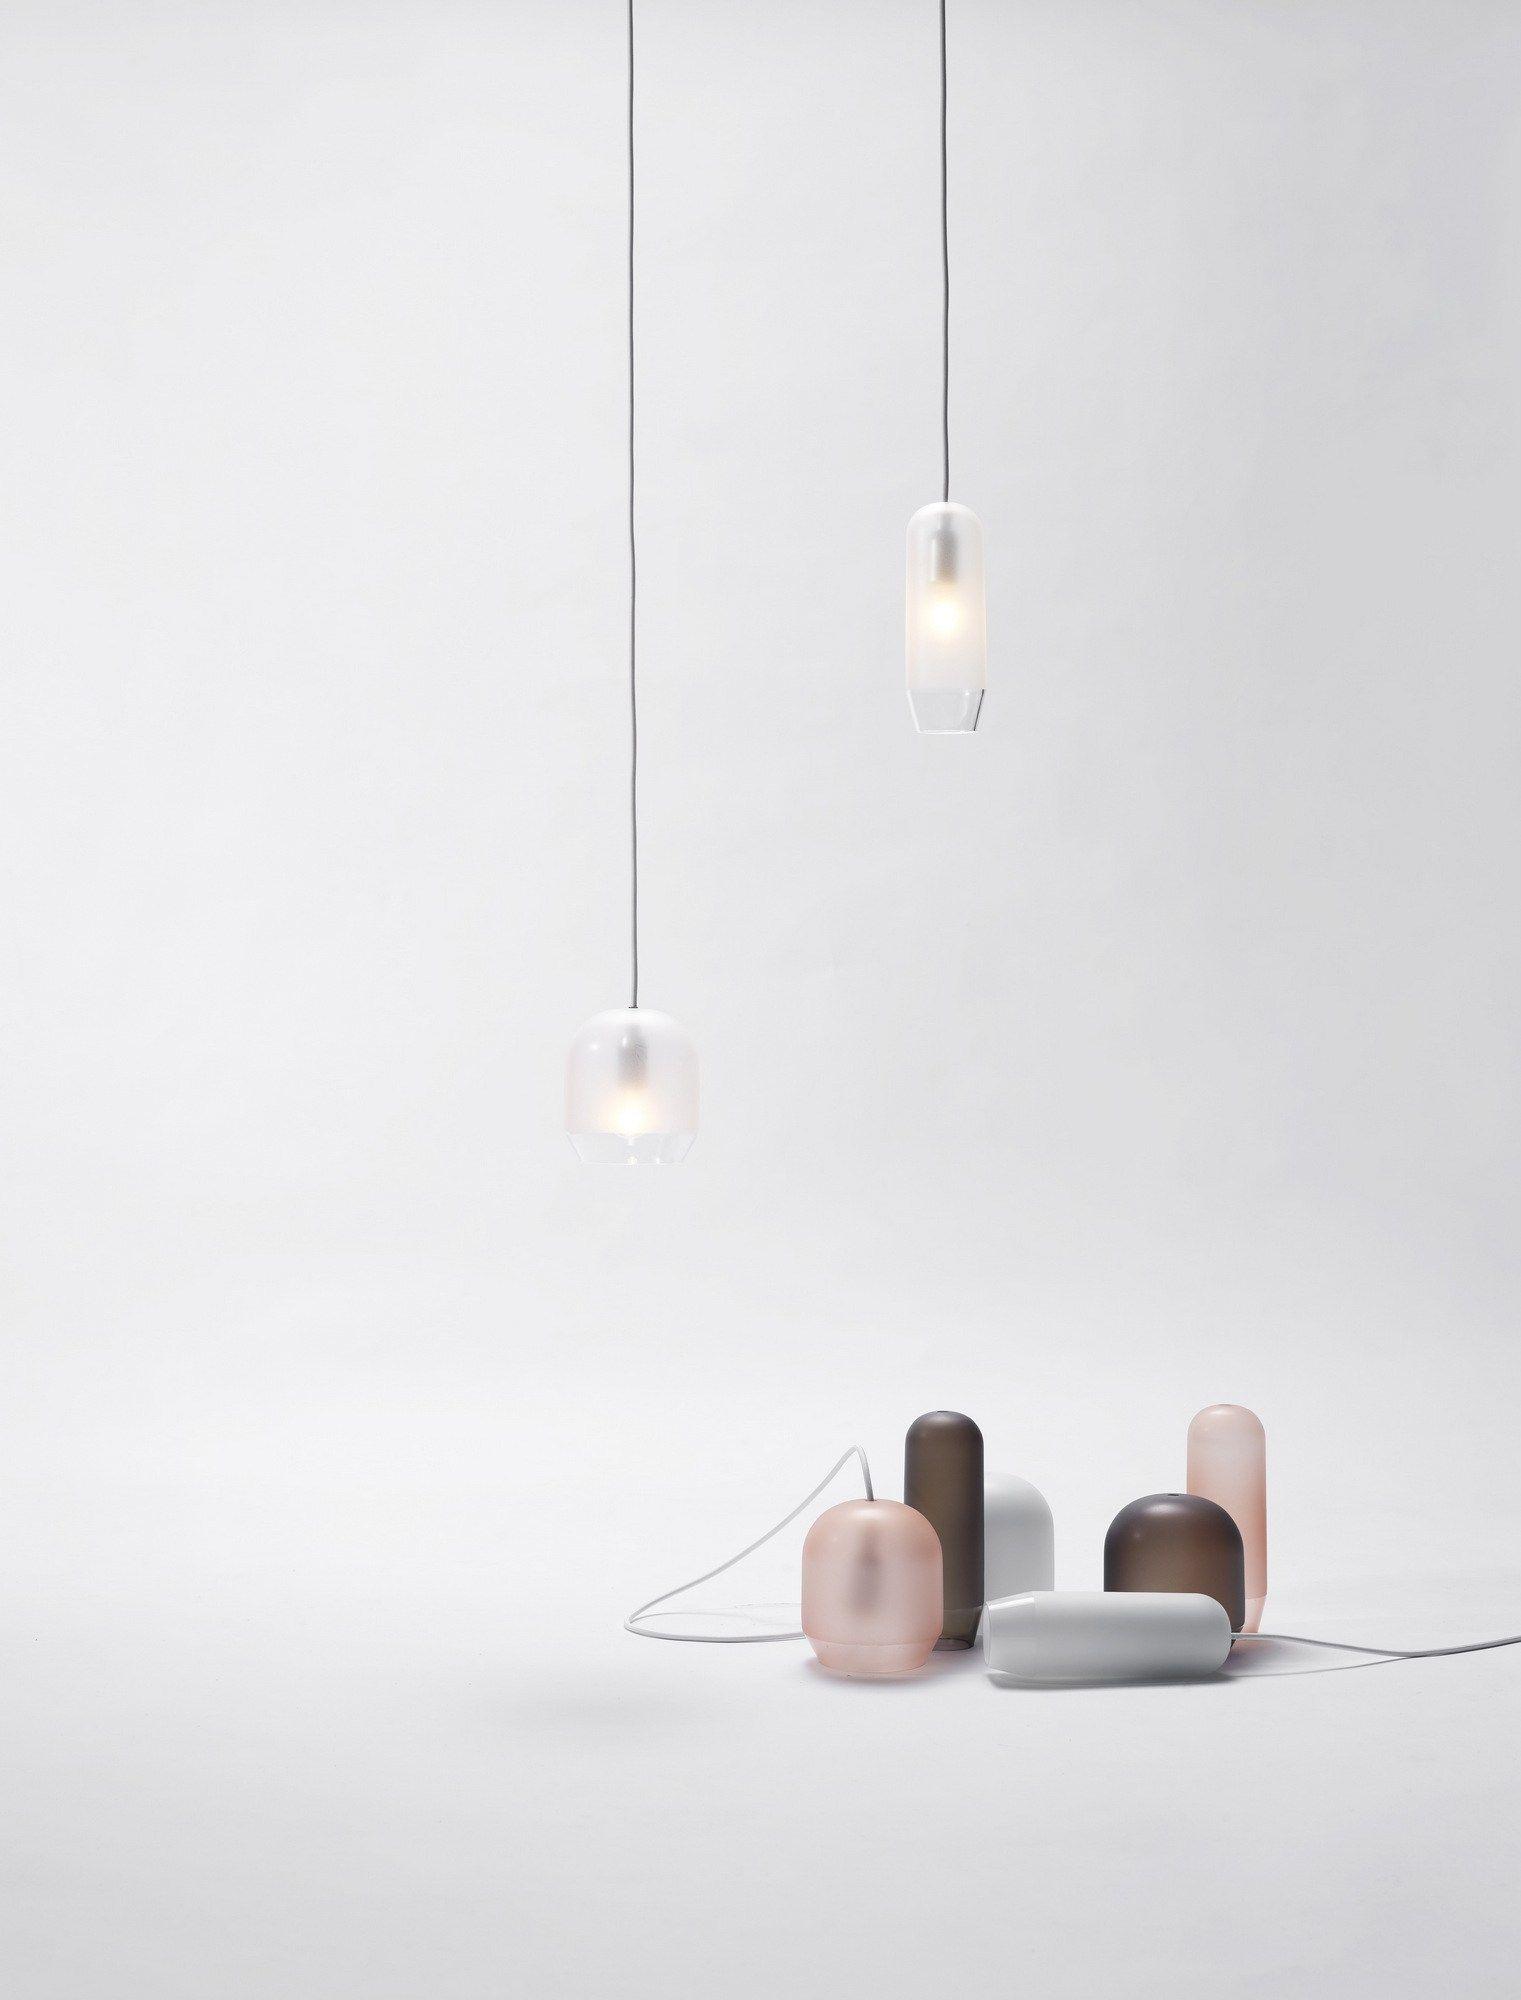 Glass Pendant Lamp Raso By Ex T Design Sebastian Herkner Glass Pendant Lamp Pendant Lamp Lamp